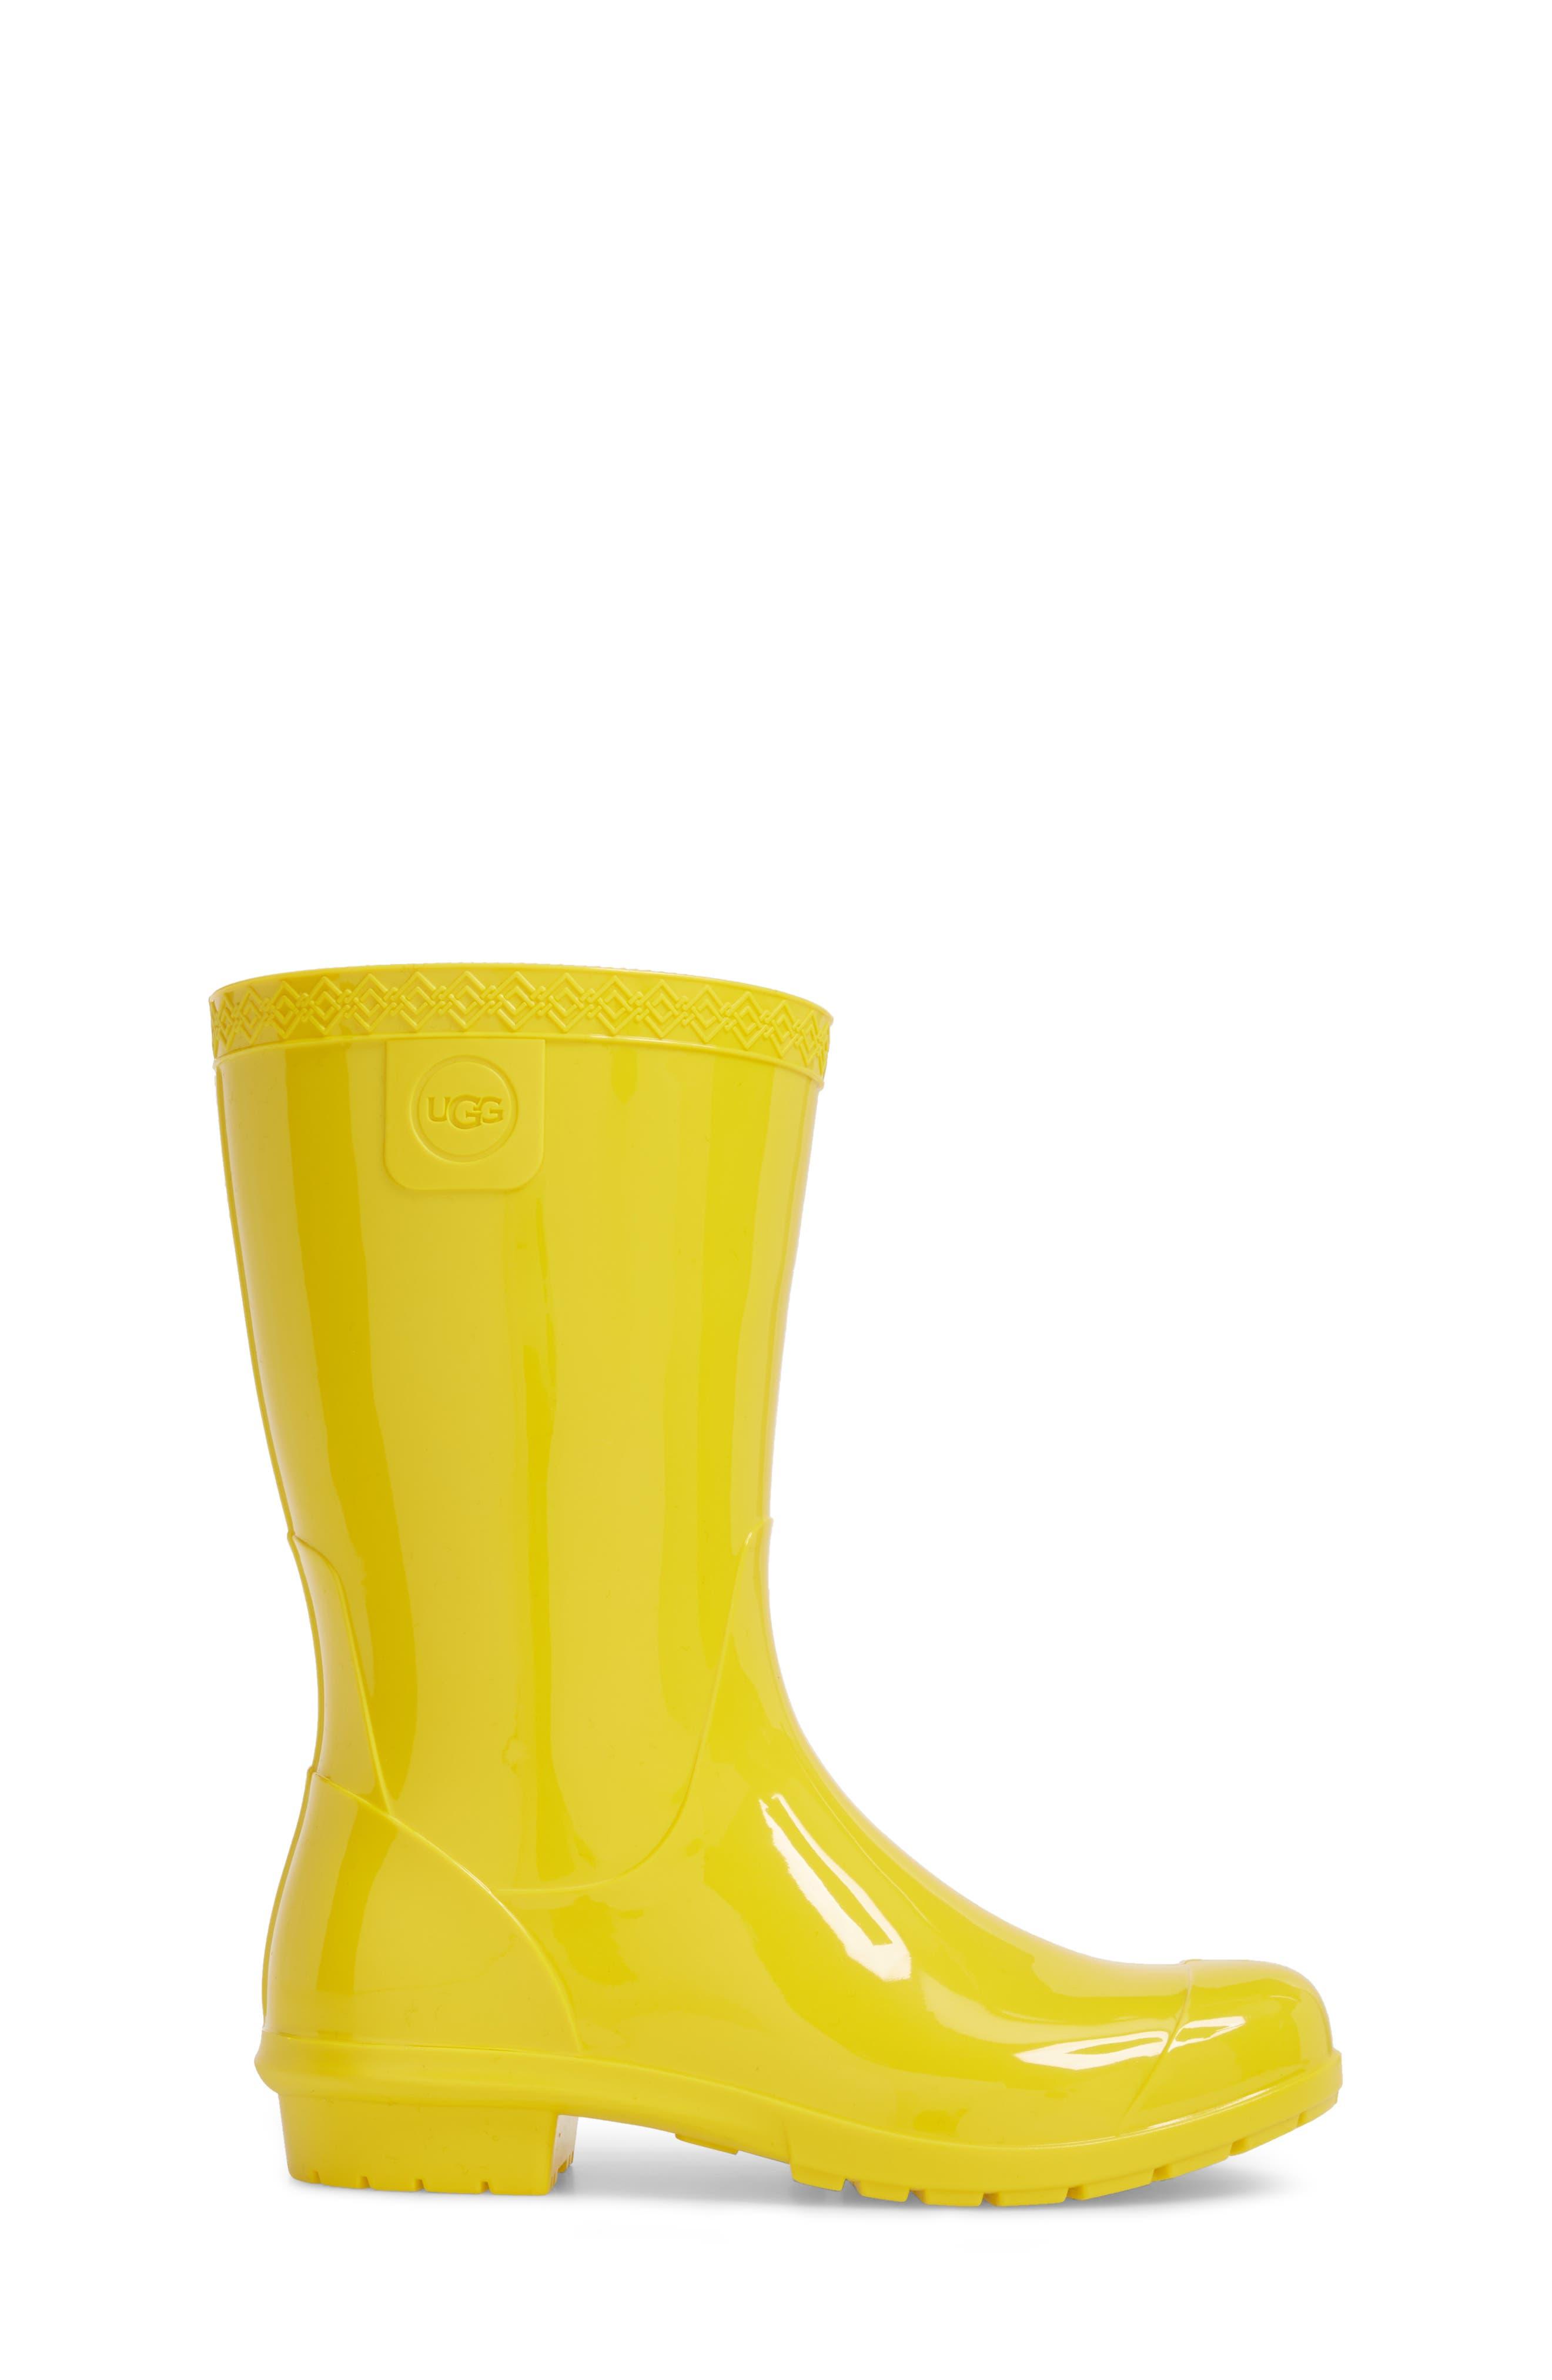 Alternate Image 3  - UGG® Raana Waterproof Rain Boot (Little Kid & Big Kid)